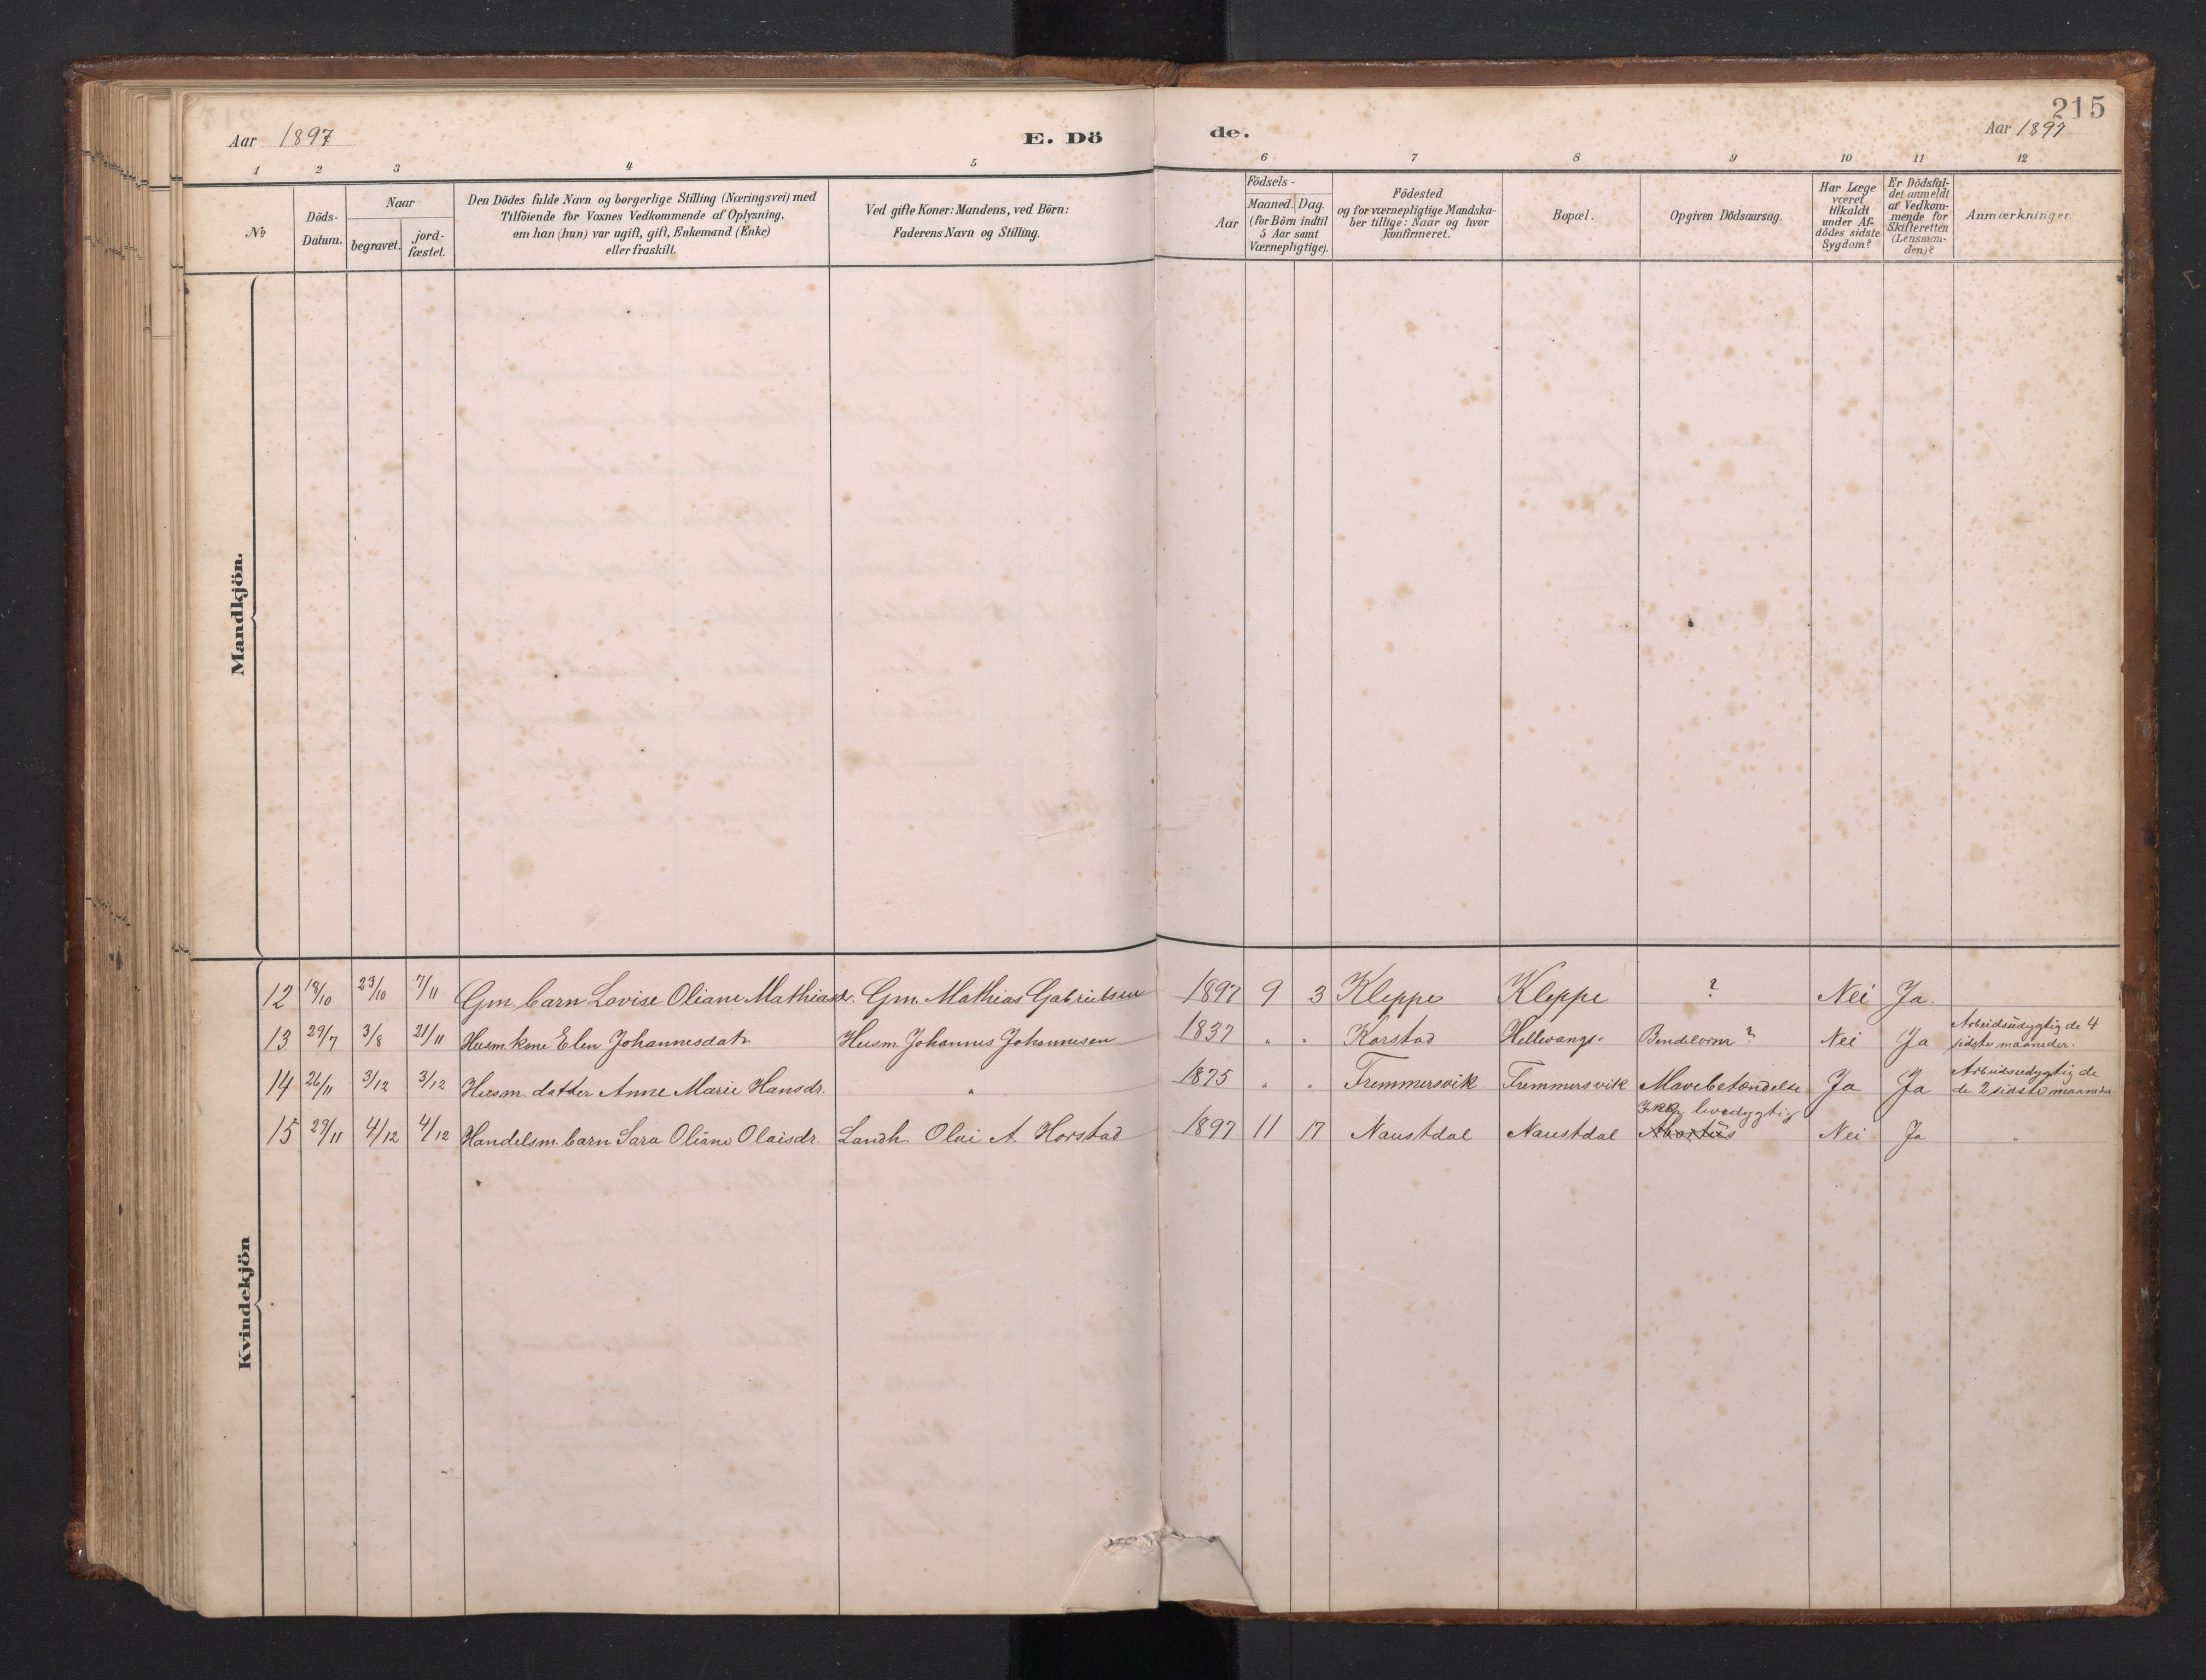 SAB, Førde Sokneprestembete, H/Hab: Klokkerbok nr. D 3, 1881-1897, s. 214b-215a